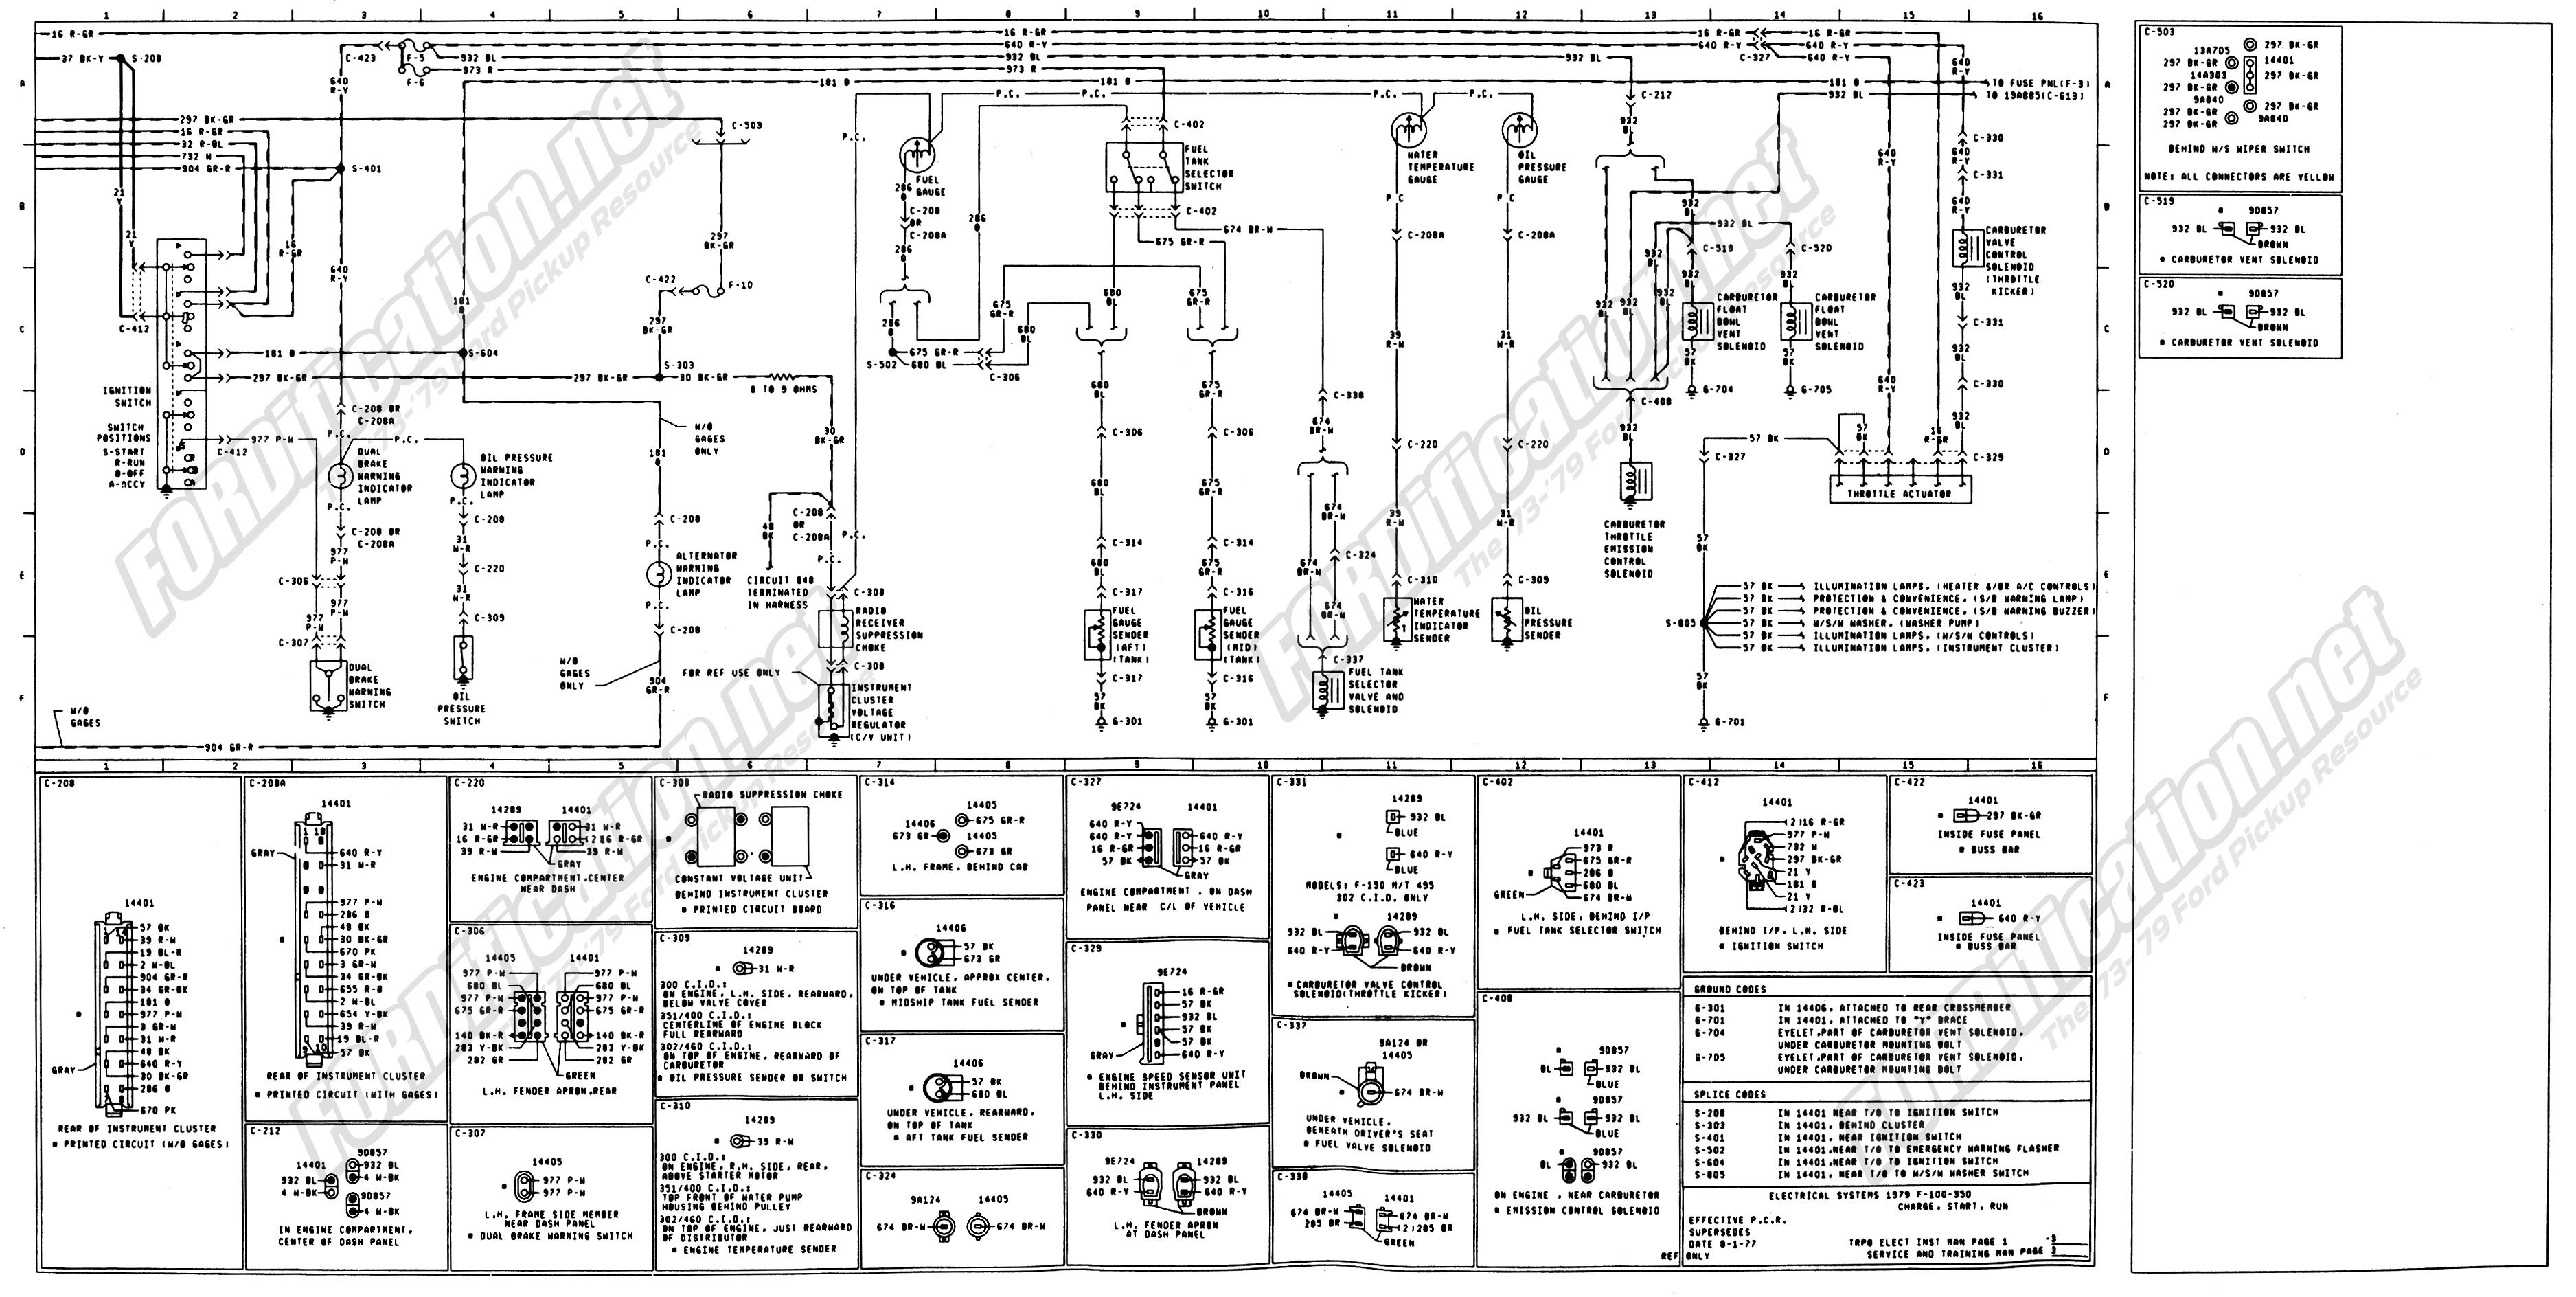 Elegant 2003 Ford F350 Wiring Diagram 52 In Delco Alternator Wiring Diagram  with 2003 Ford F350